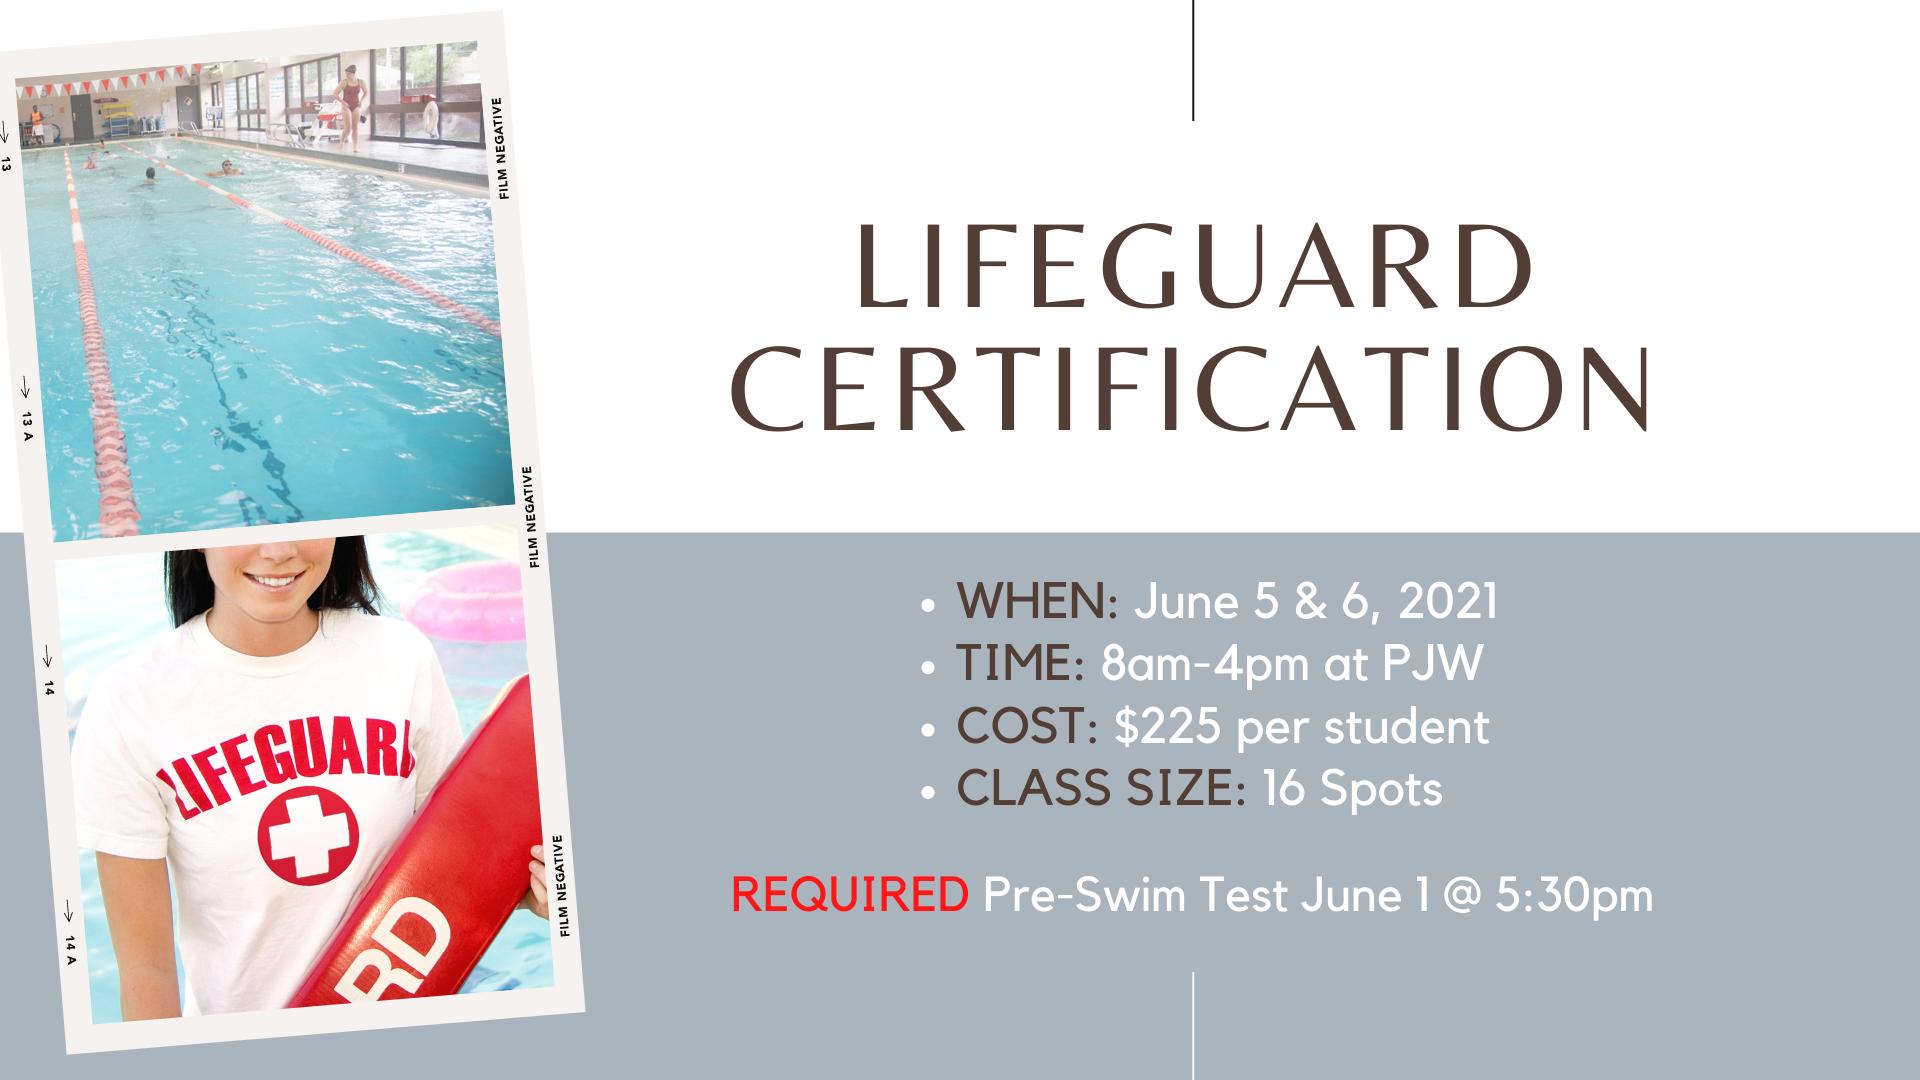 lifeguard certification for june